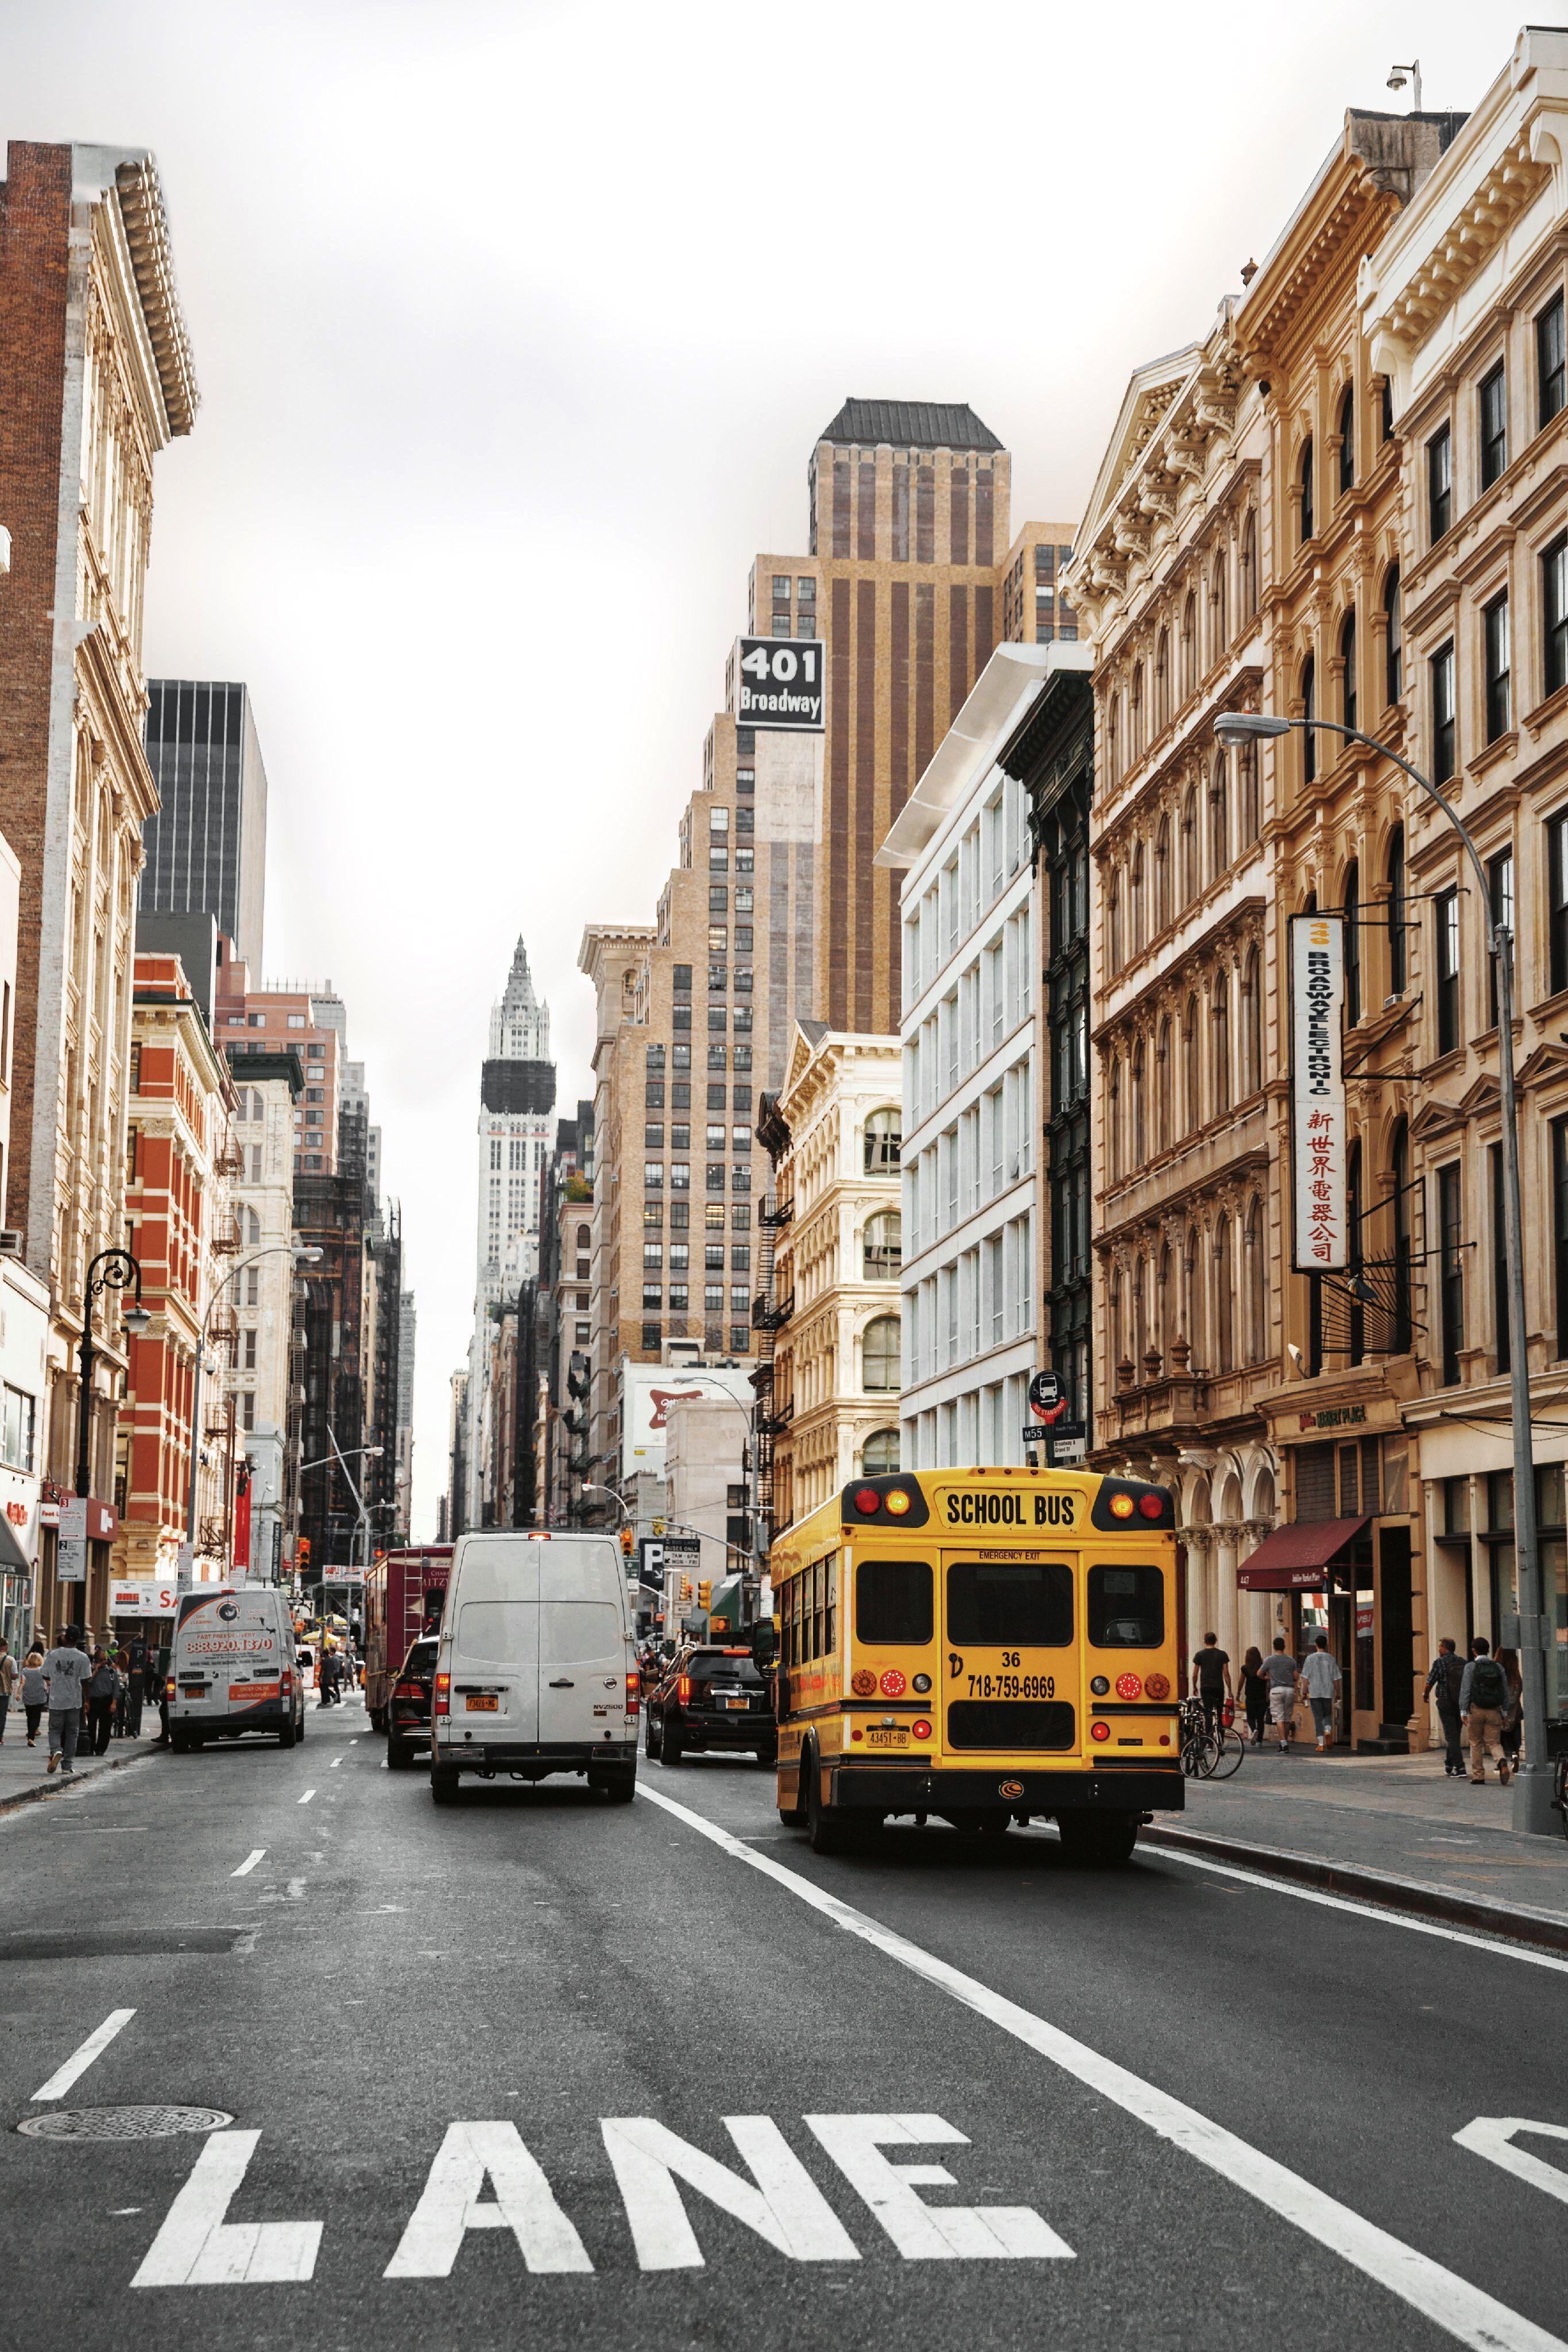 , NYC Manhattan New York Citypinterest & instagram • emilyswartzer, Hot Models Blog 2020, Hot Models Blog 2020